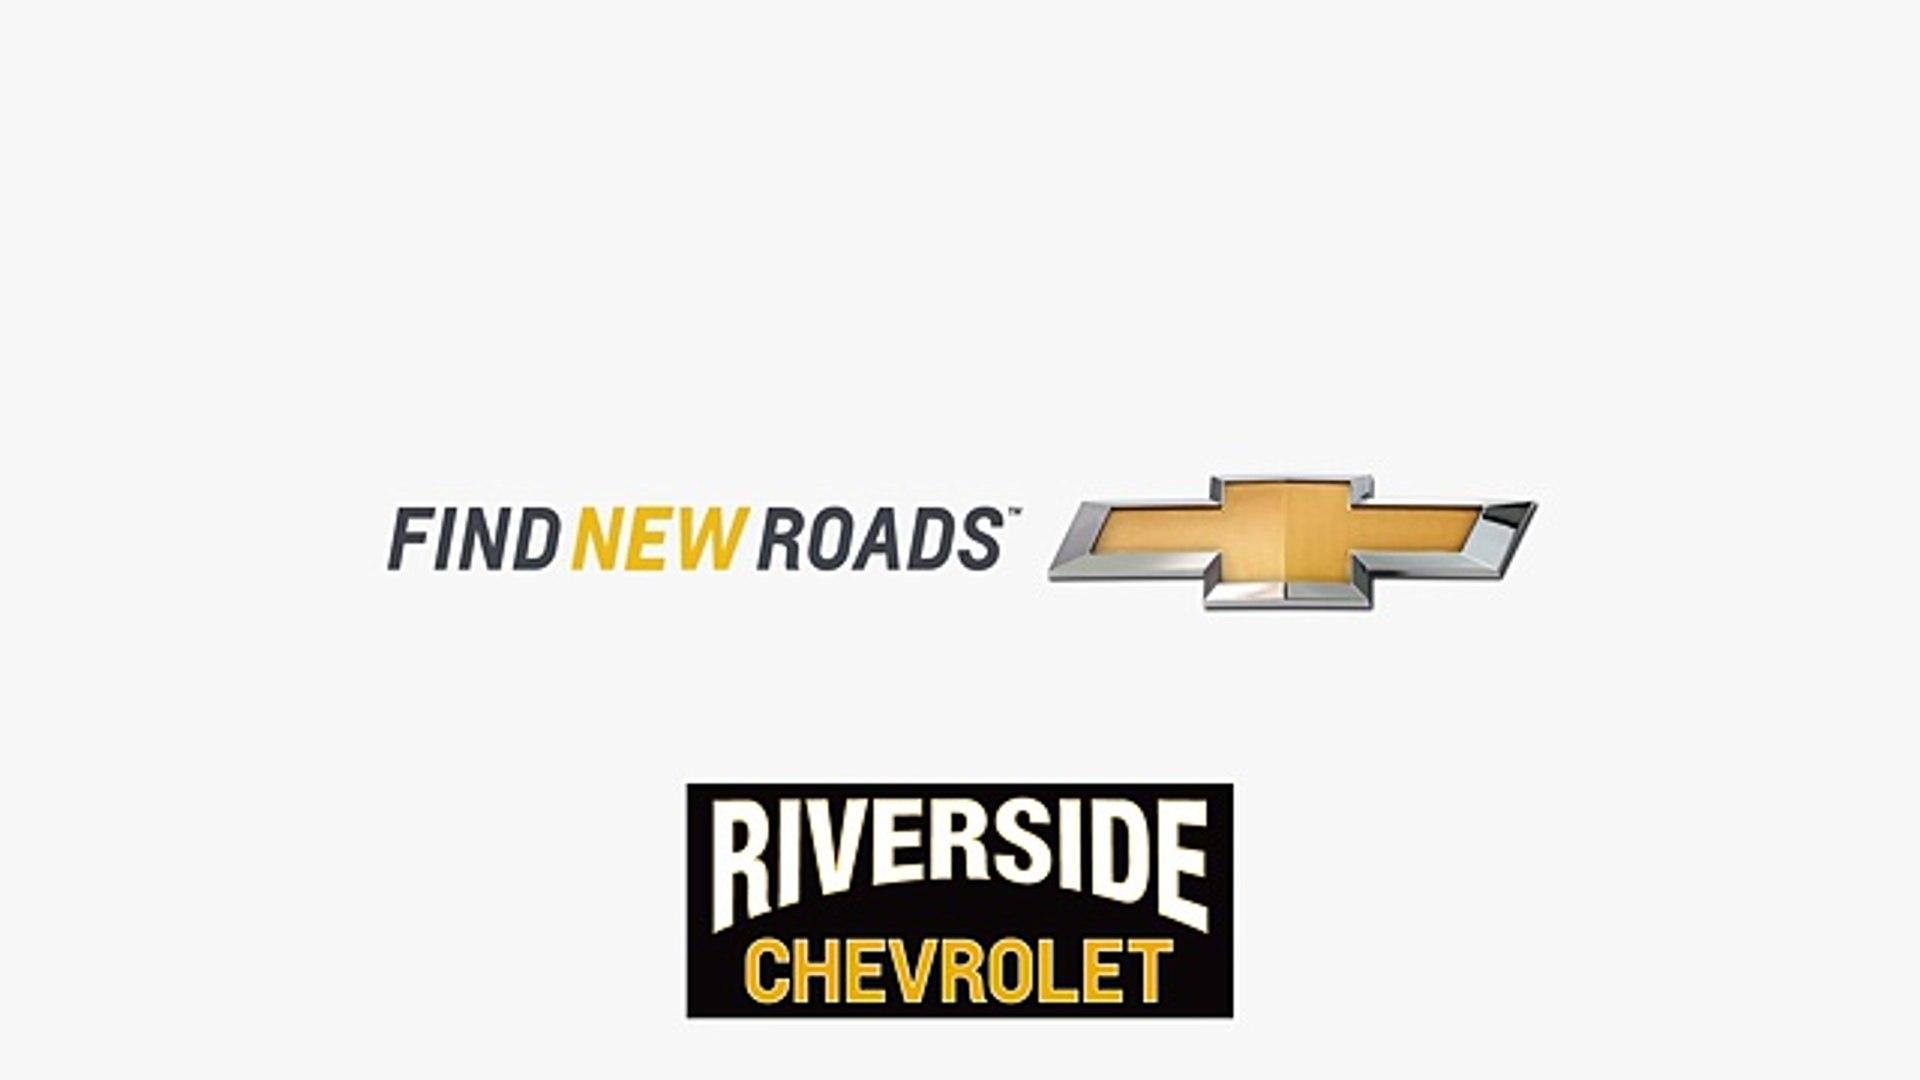 2018 Chevrolet Impala Ontario, CA   New Chevy Impala Dealer Ontario, CA